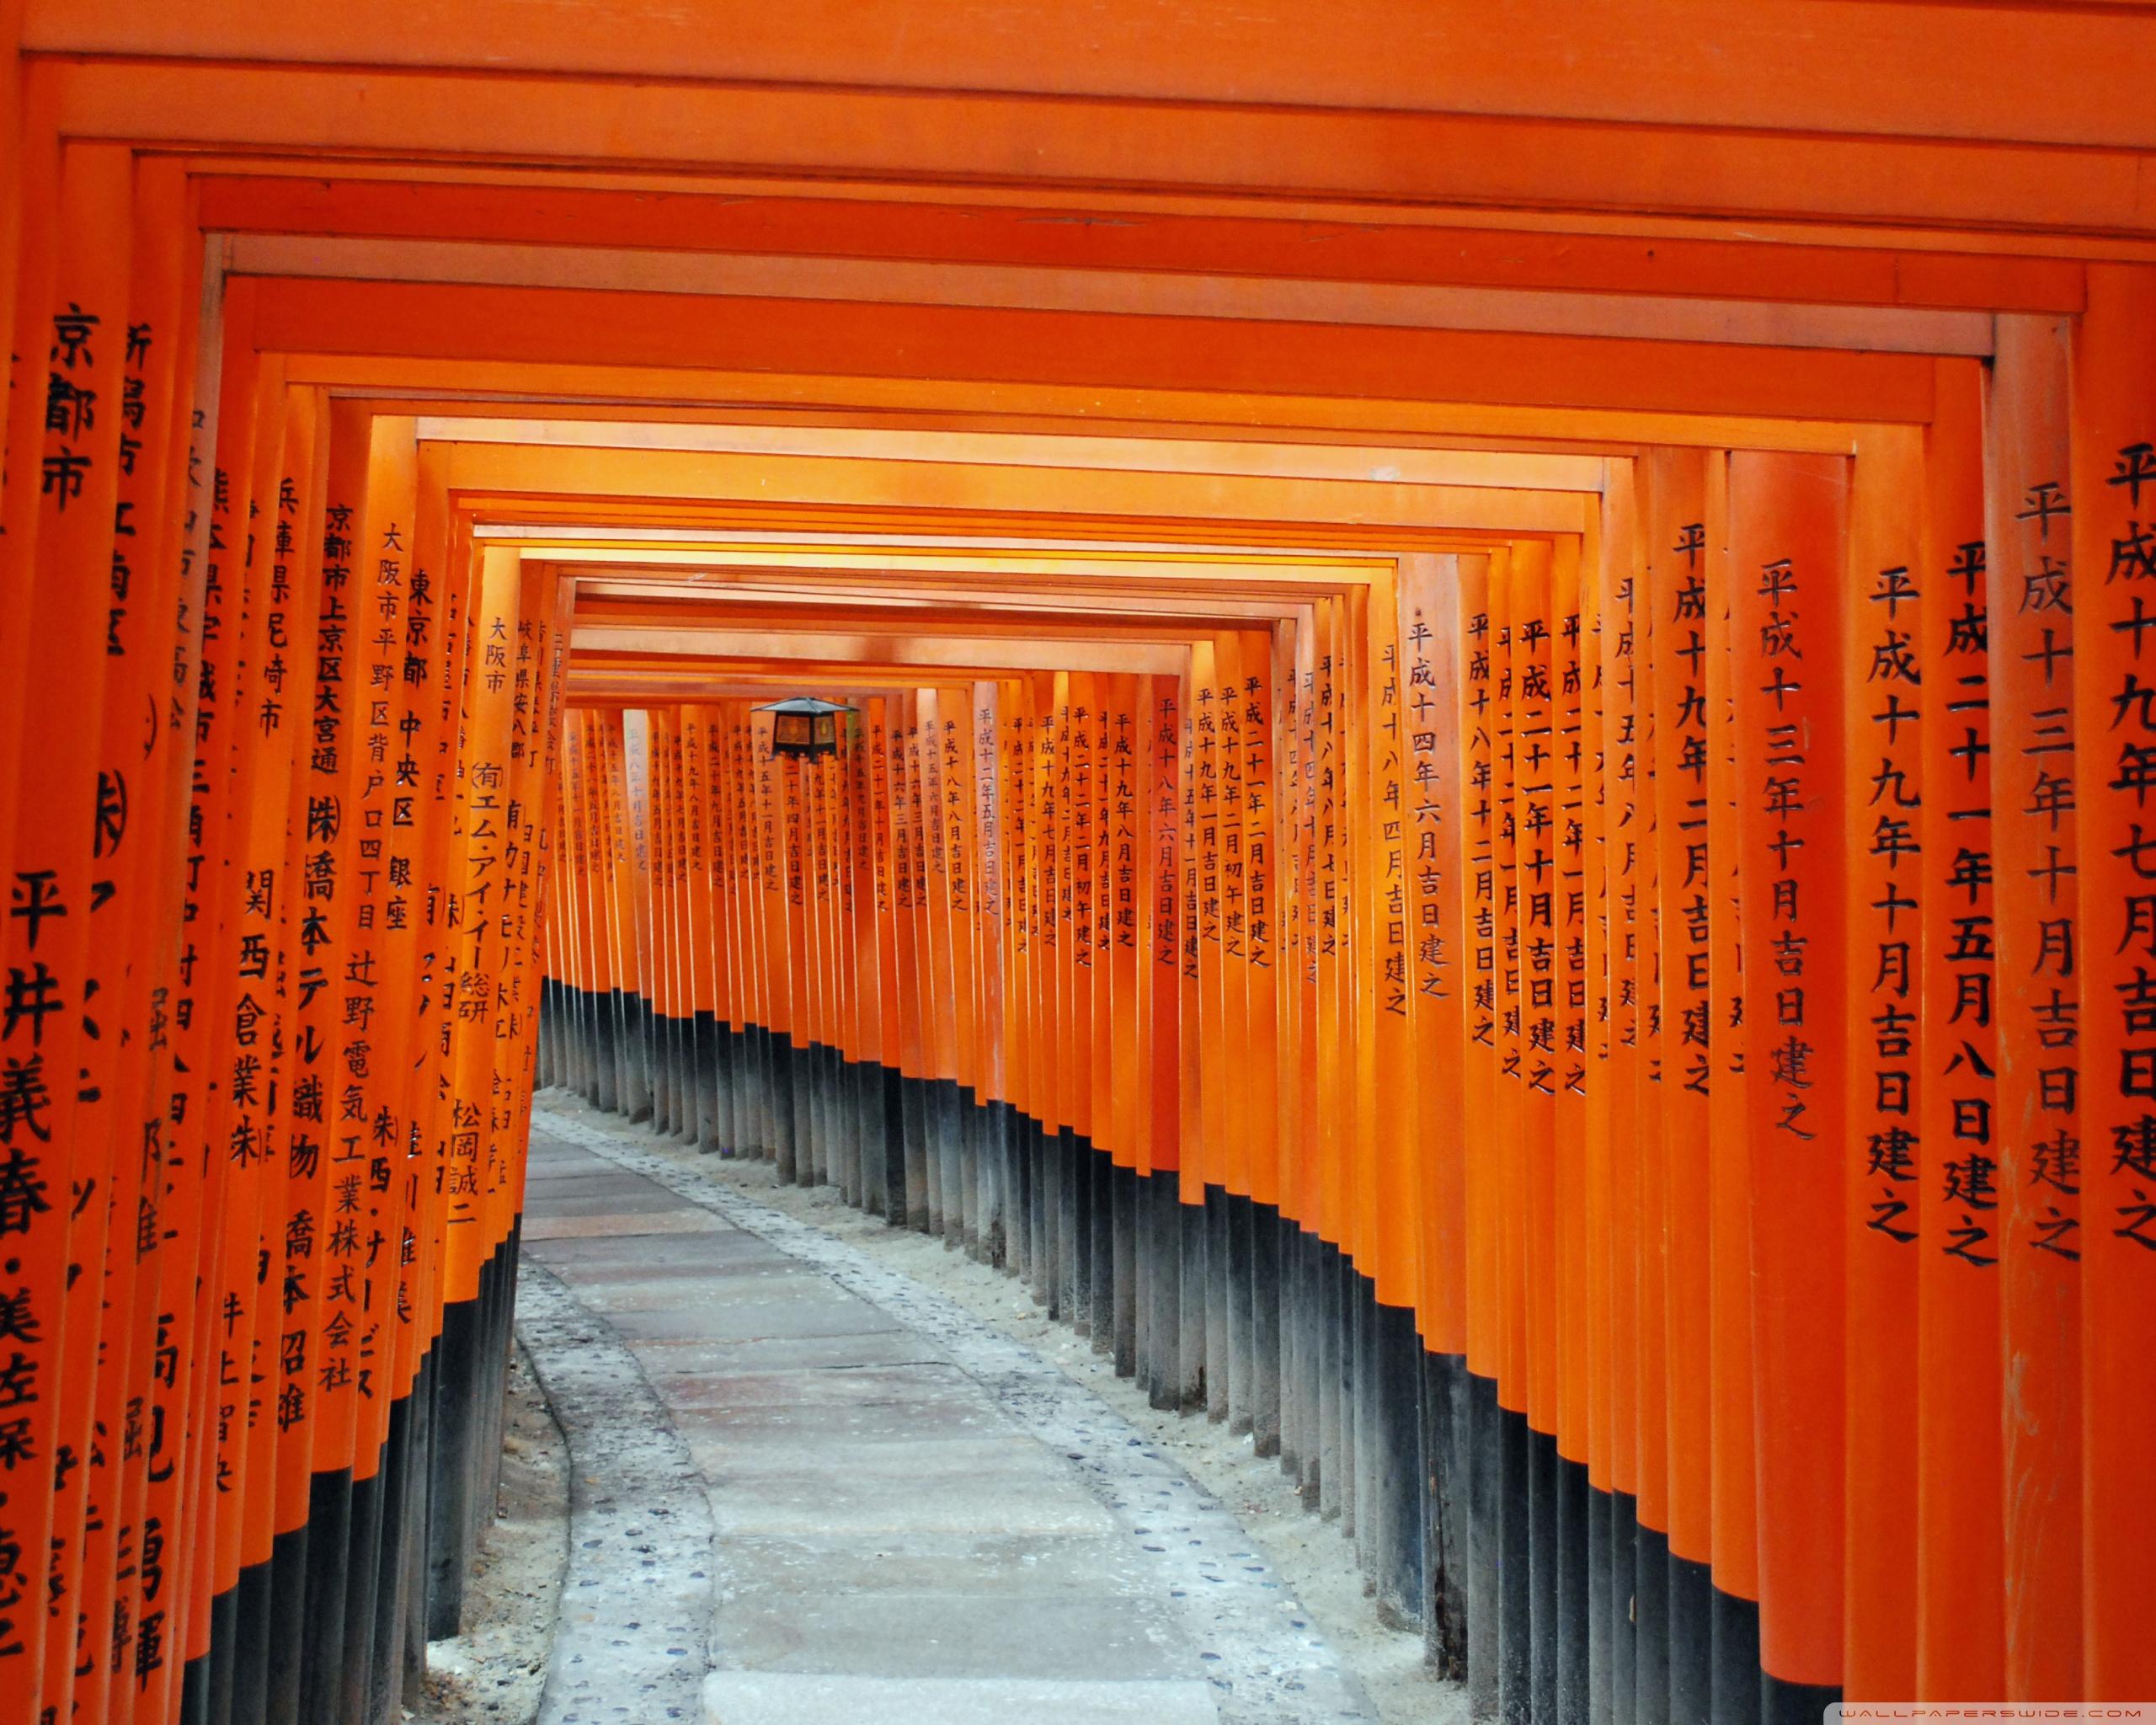 Fushimi Inari Taisha Kyoto Japan 4K HD Desktop Wallpaper for 2560x2048